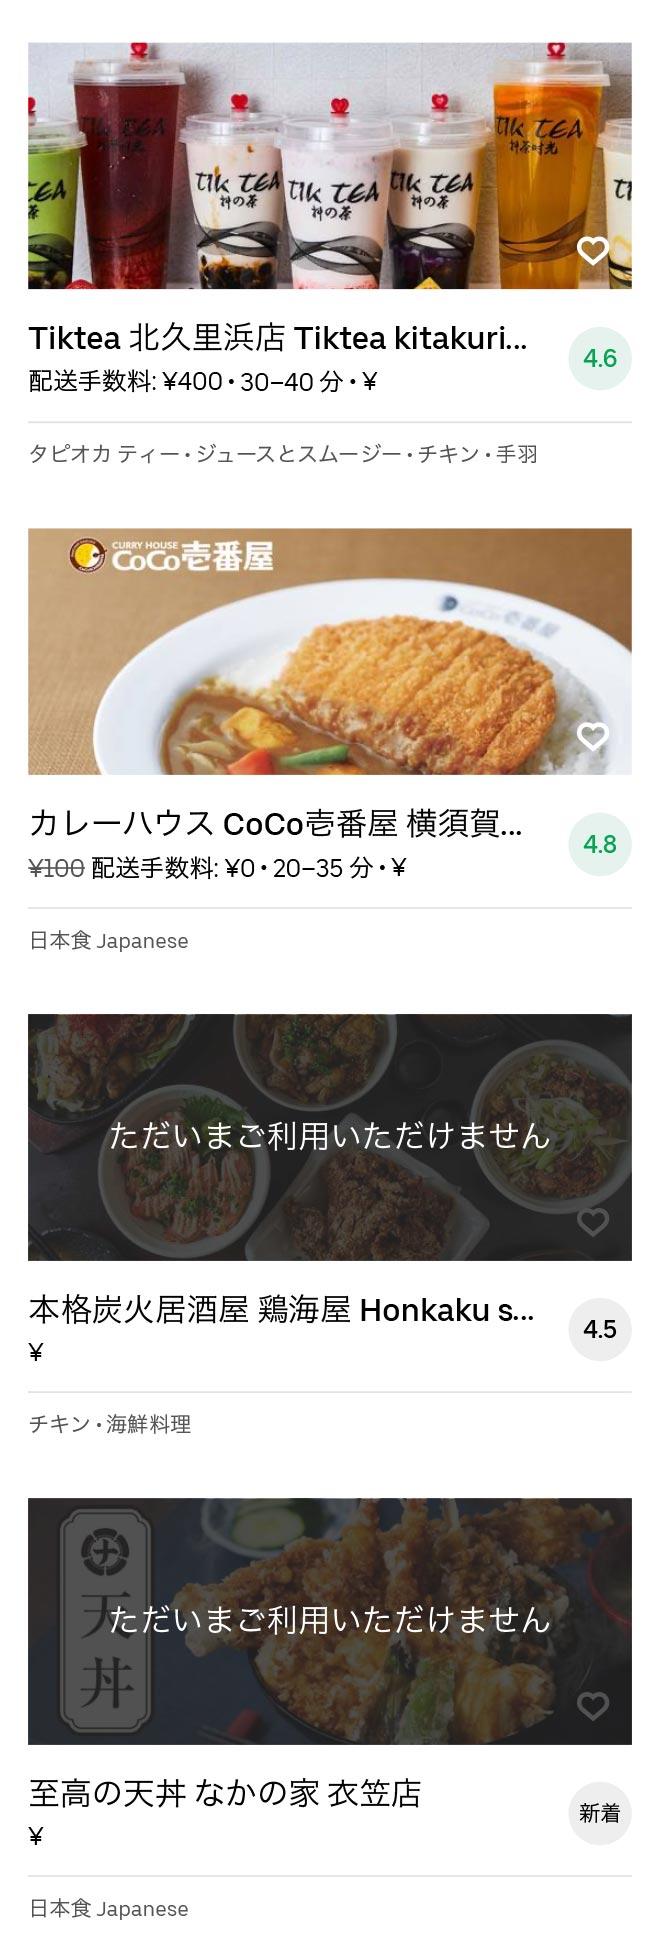 Yokosuka chuo menu 2008 07